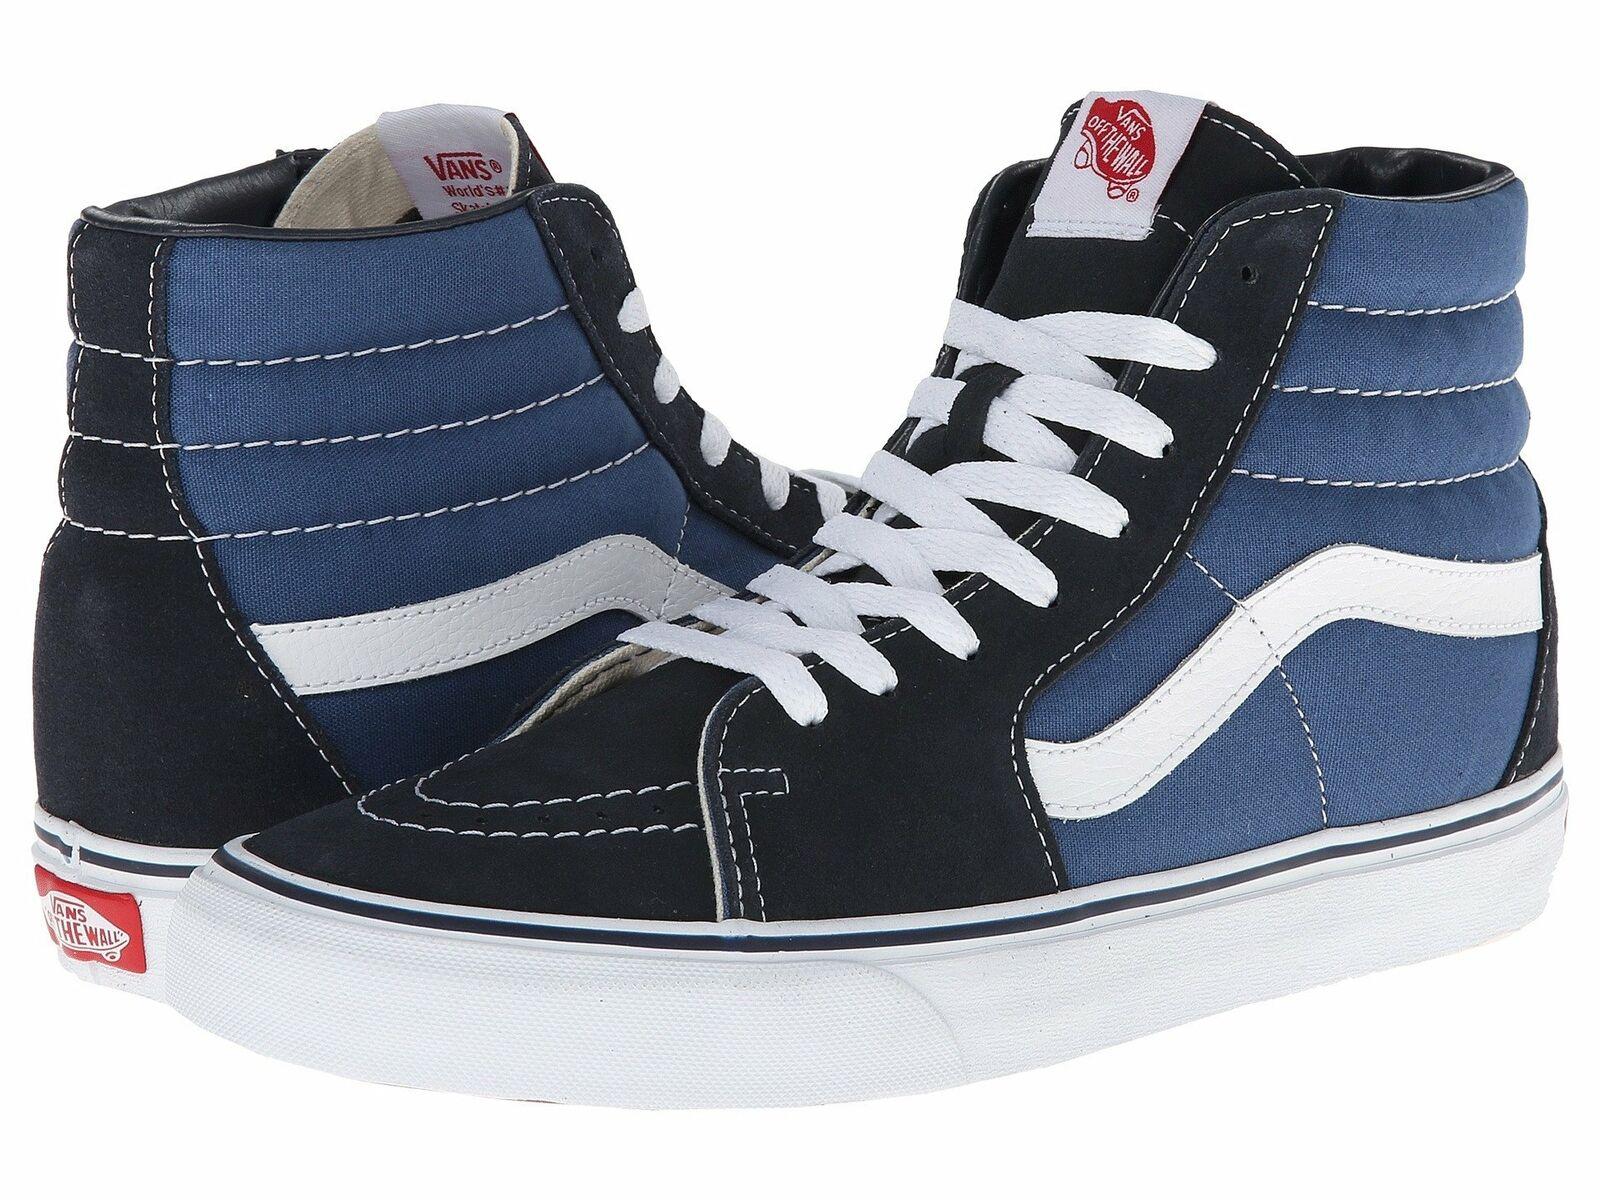 Vans Sk8 Hi Lace Up Sneaker Black Black Navy